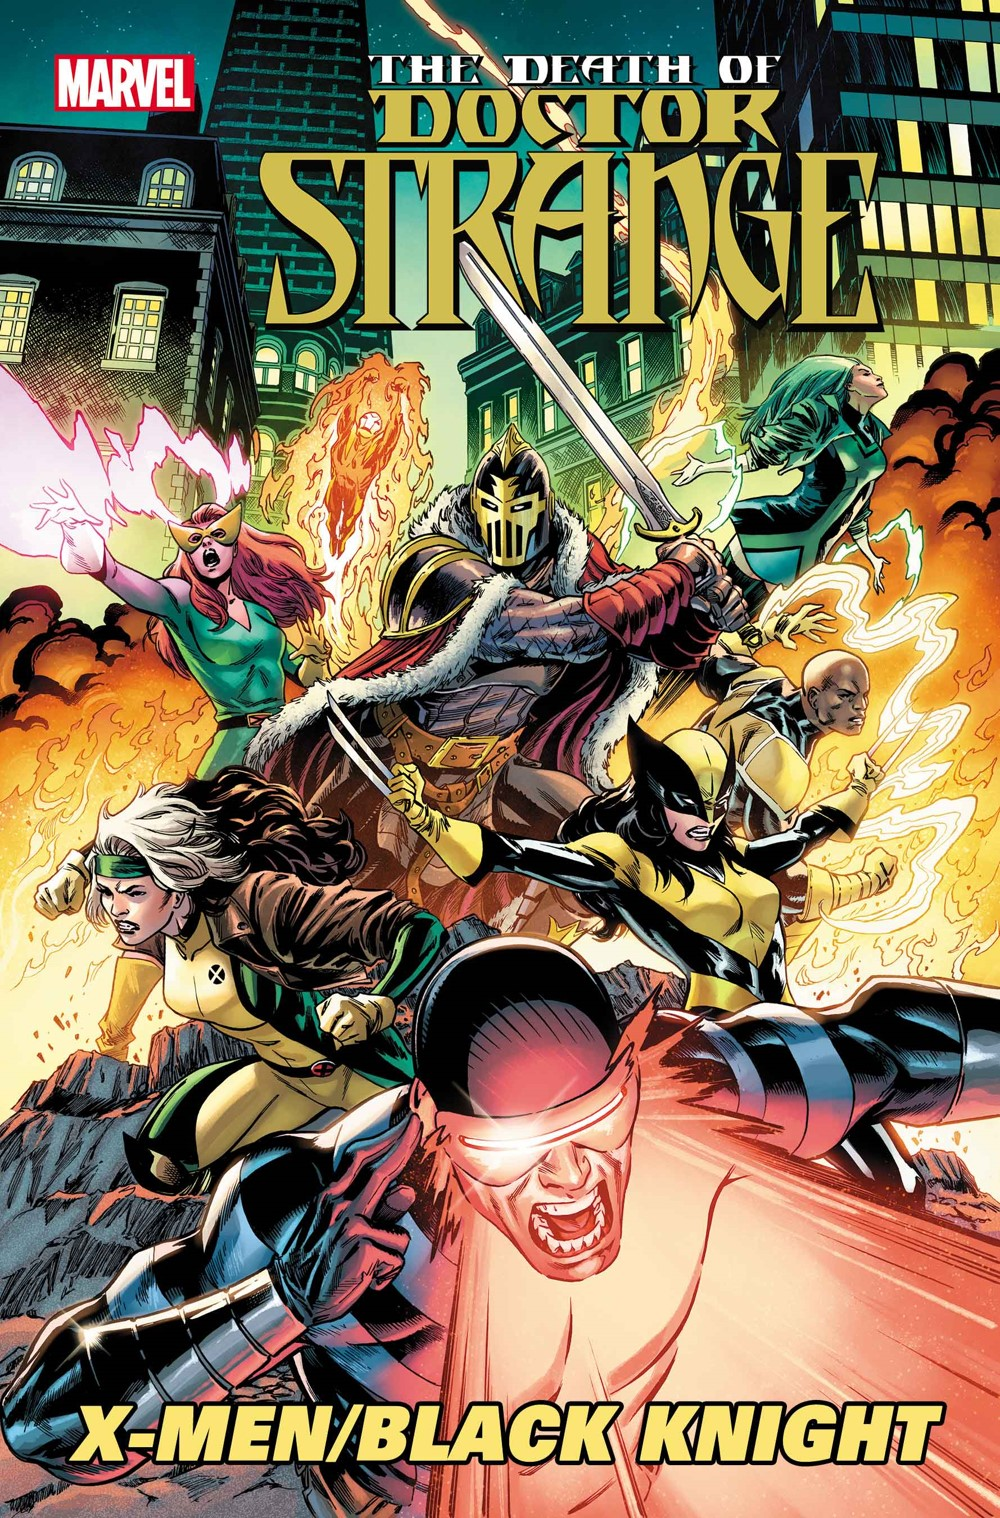 DRSDEATHBKX001_cov Marvel Comics December 2021 Solicitations